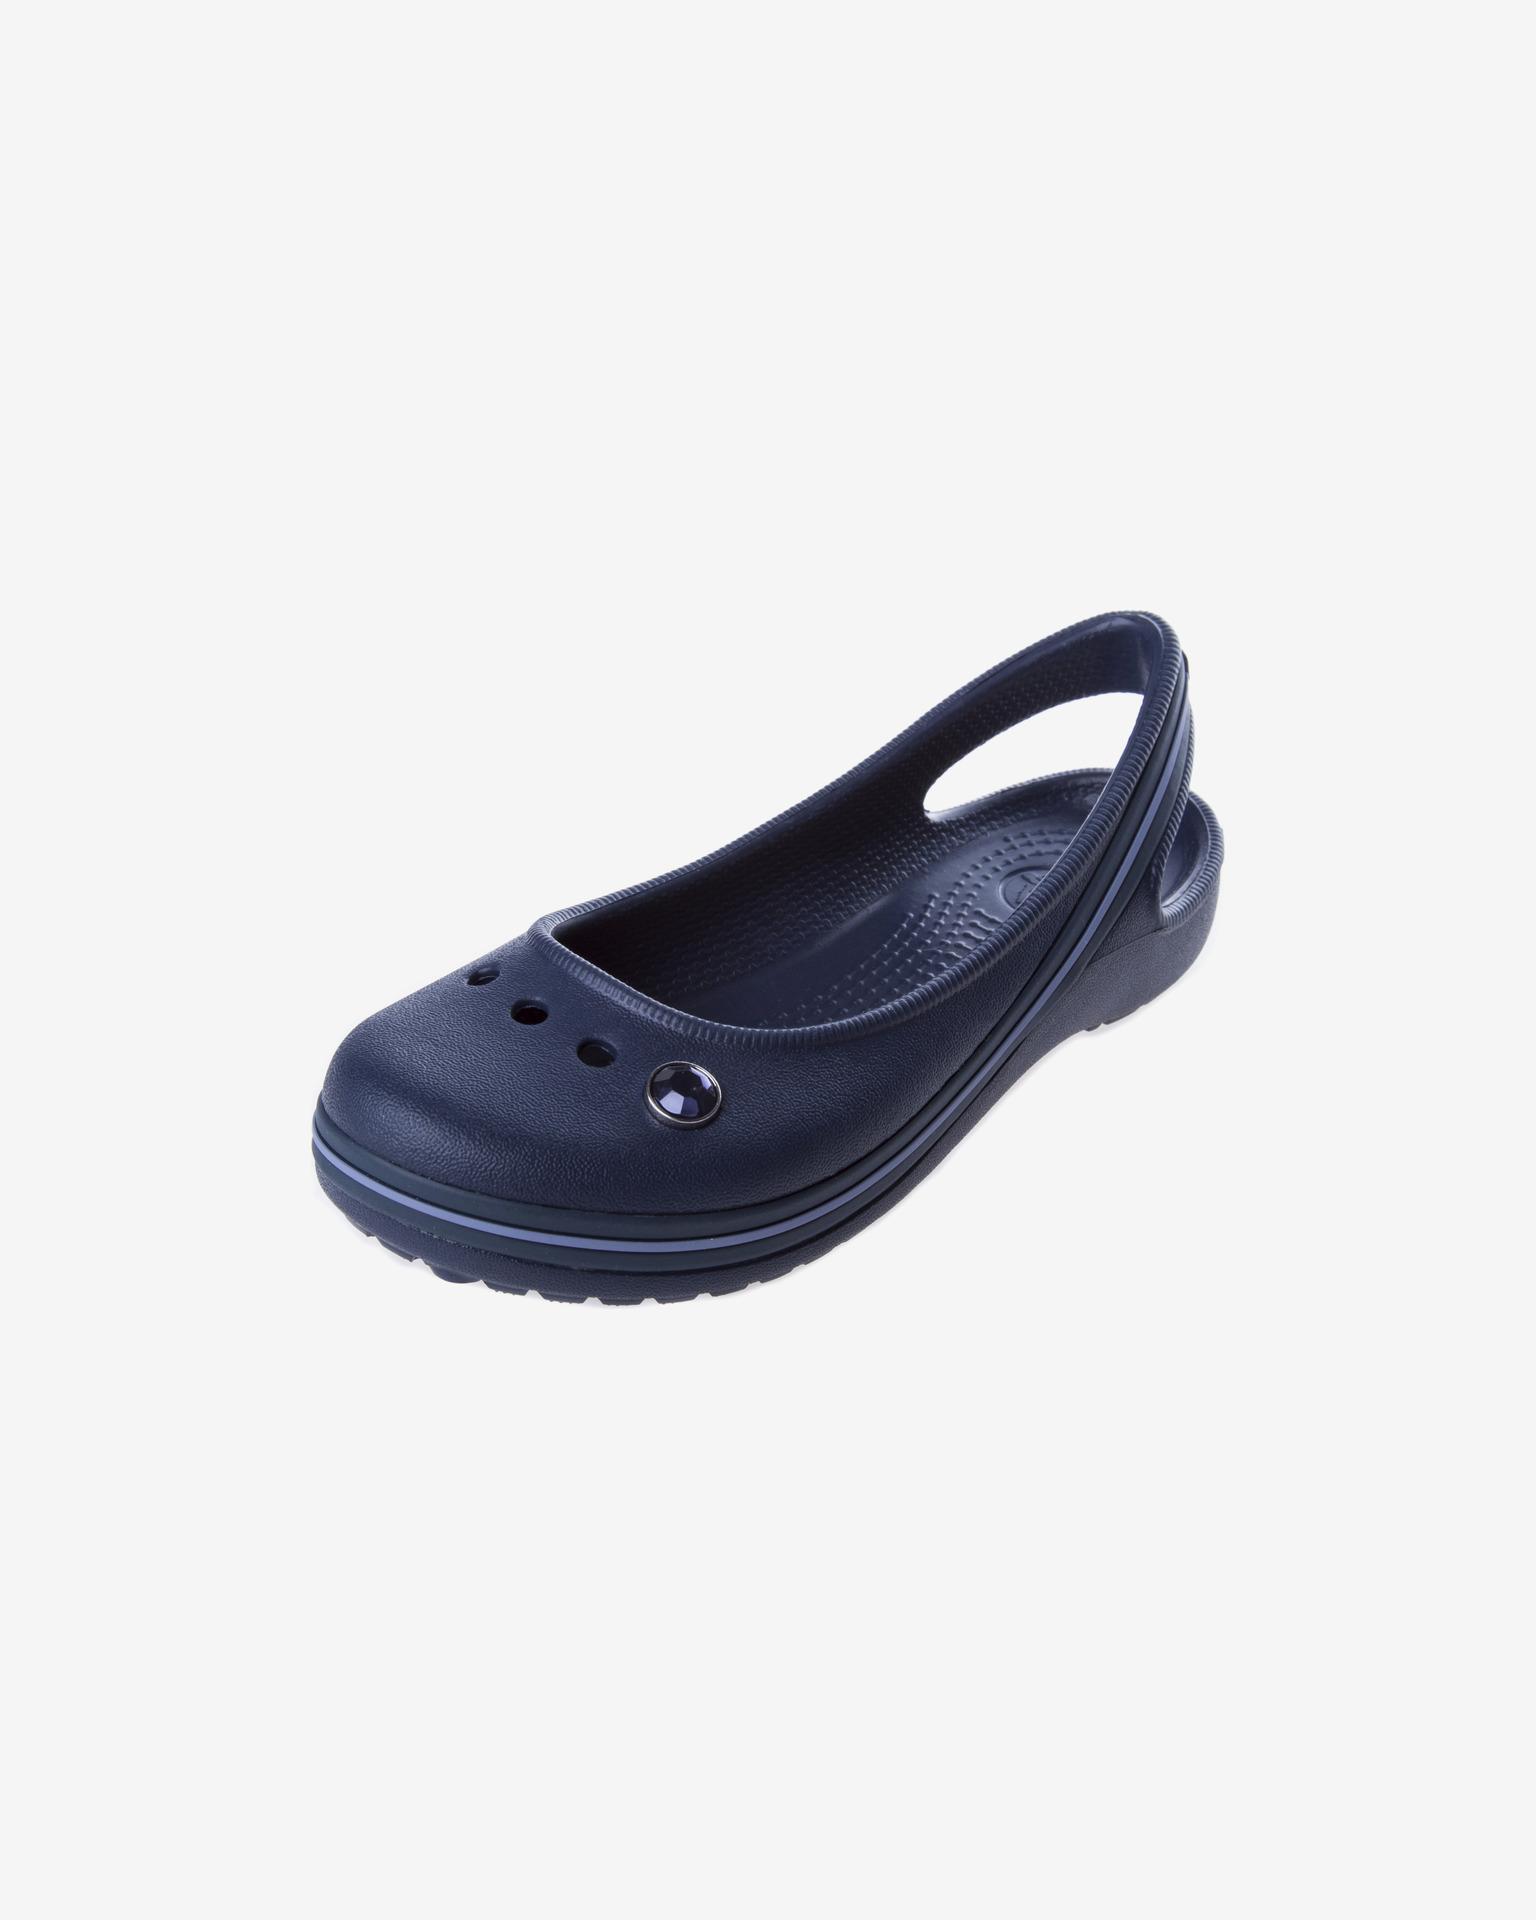 045508bd224 Crocs - Genna II Gem Baleríny detské